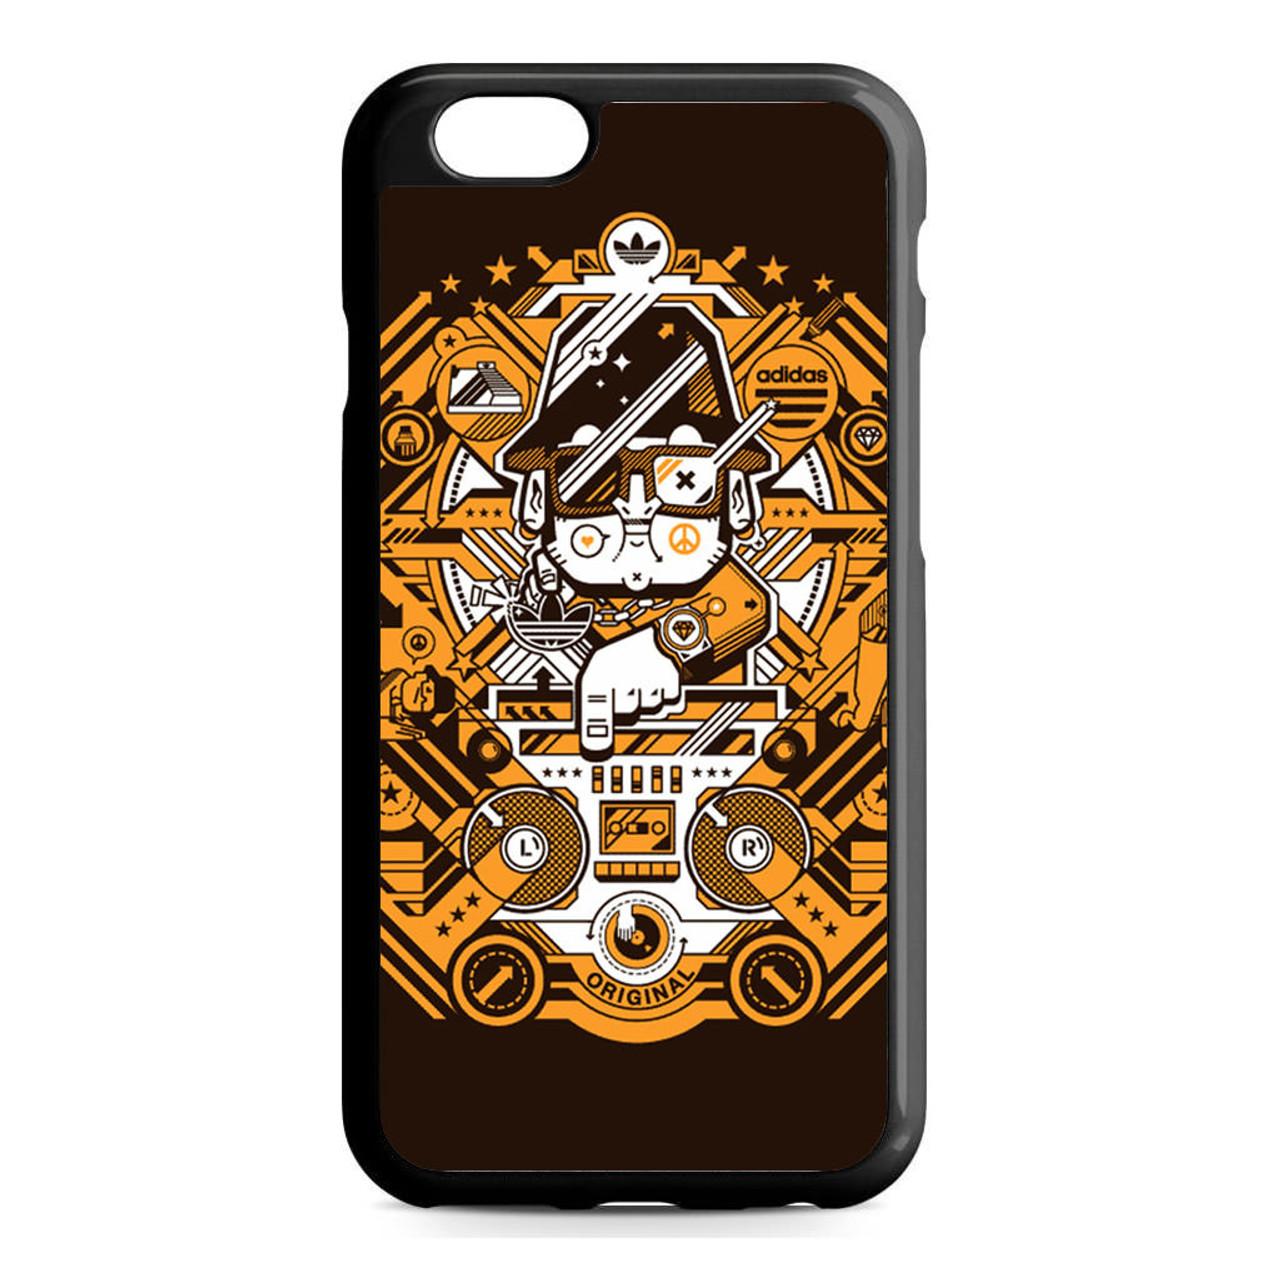 premium selection d8391 e9b9e Adidas Style iPhone 6/6S Case